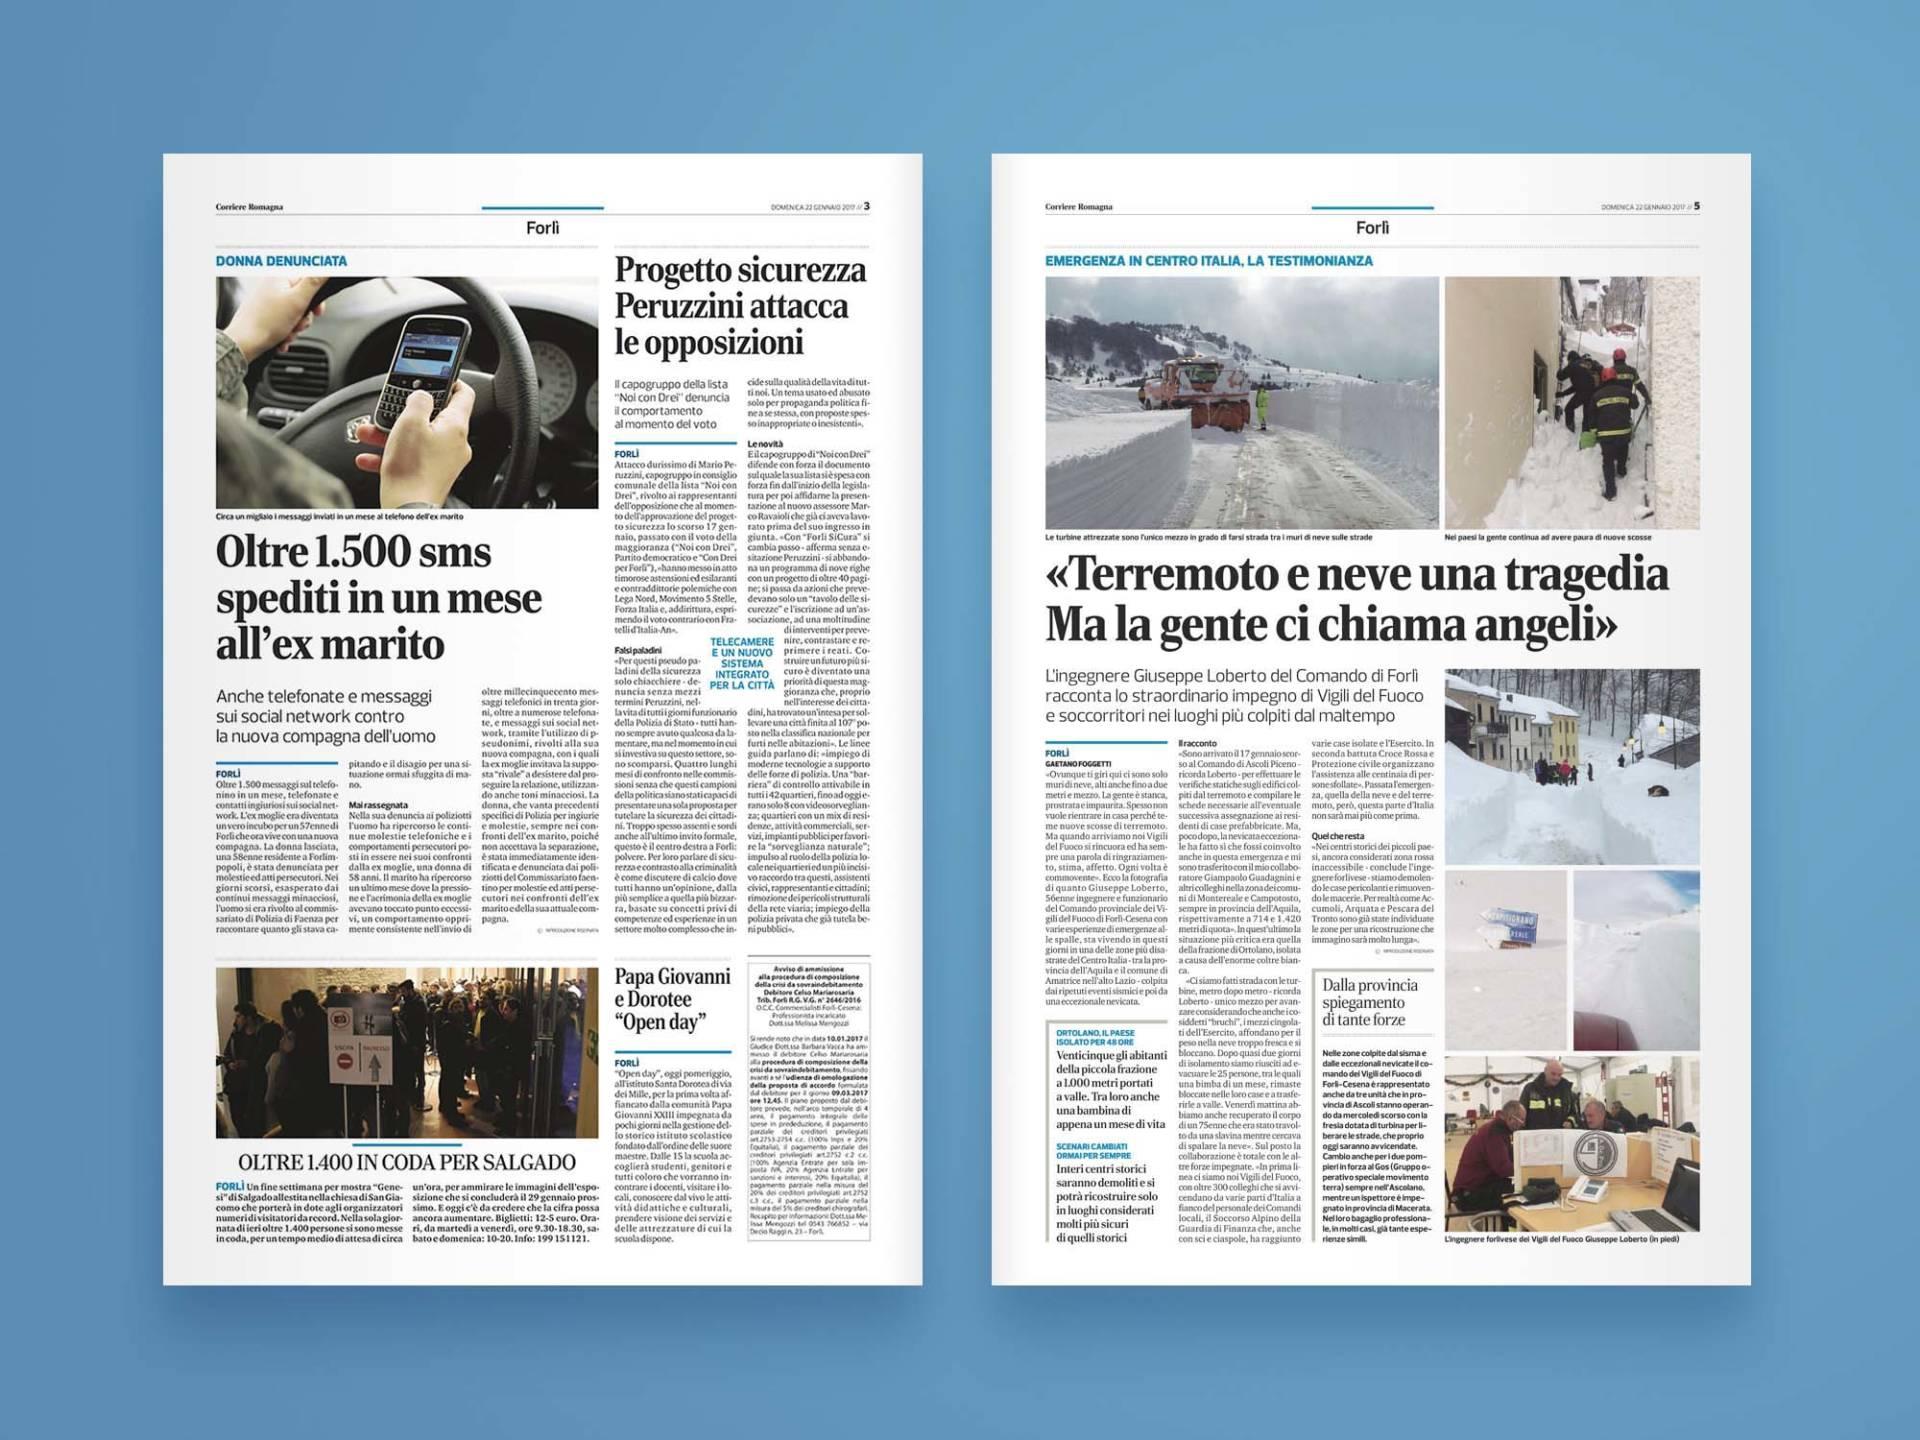 Corriere_Romagna_03_Wenceslau_News_Design